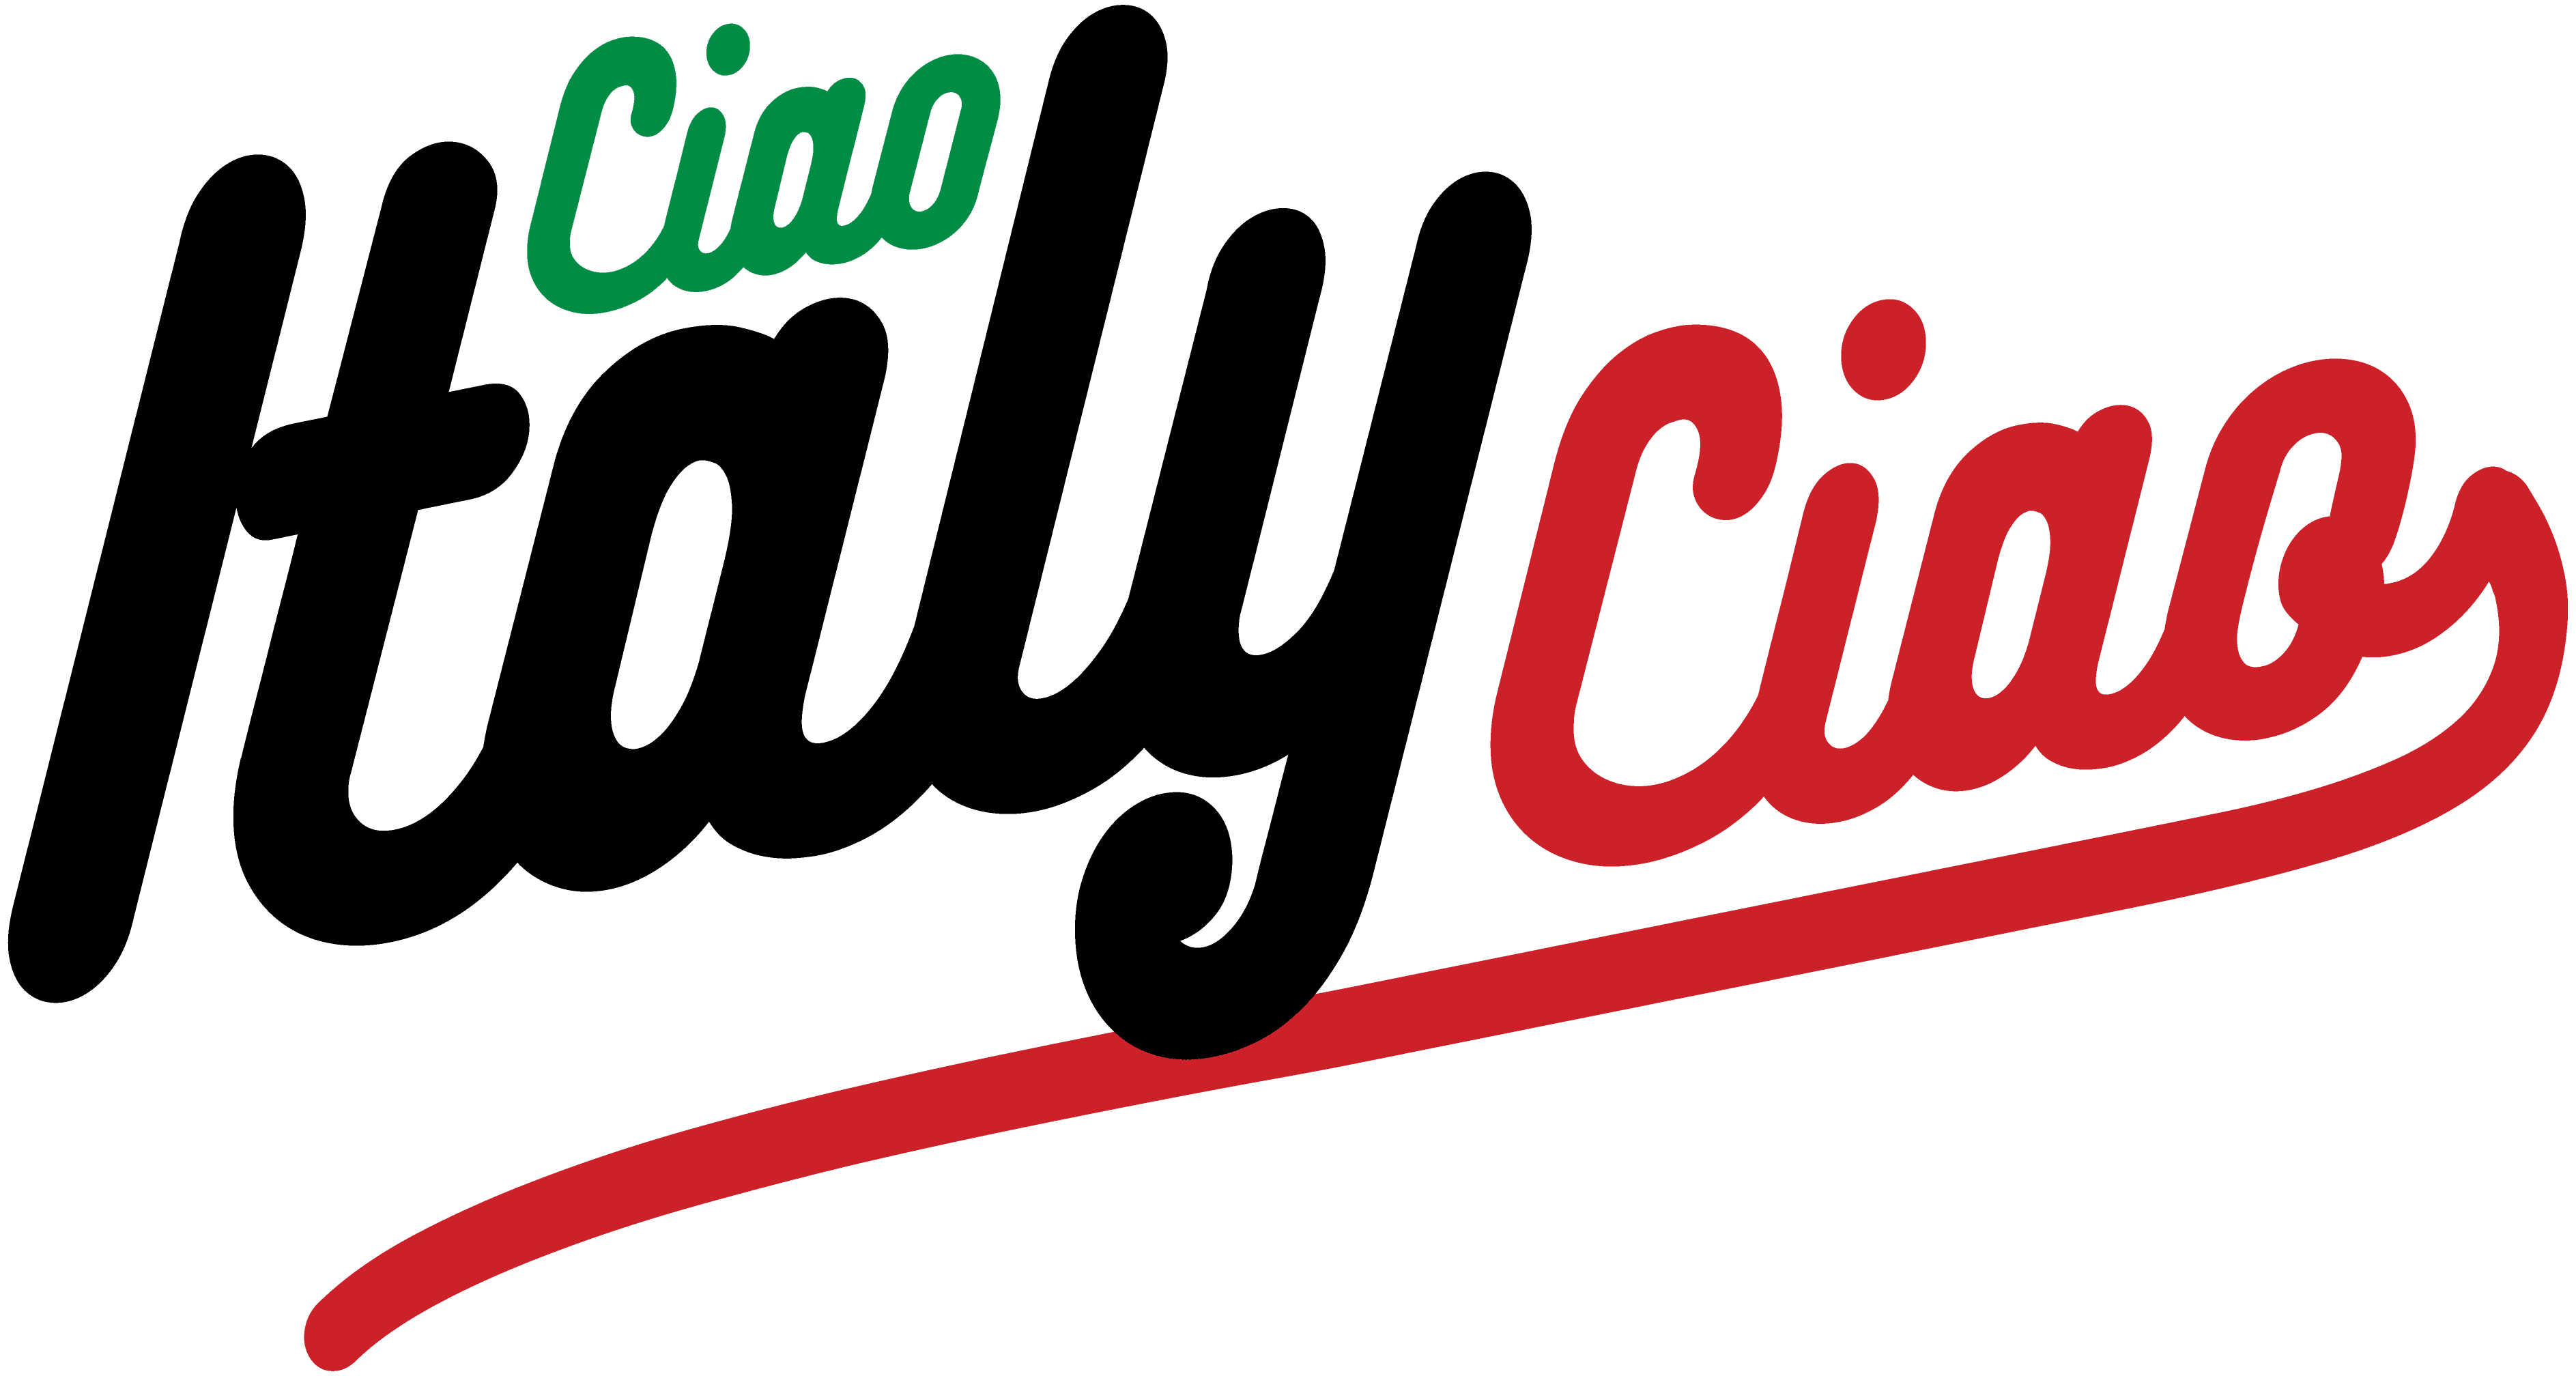 Ciao Italy Ciao